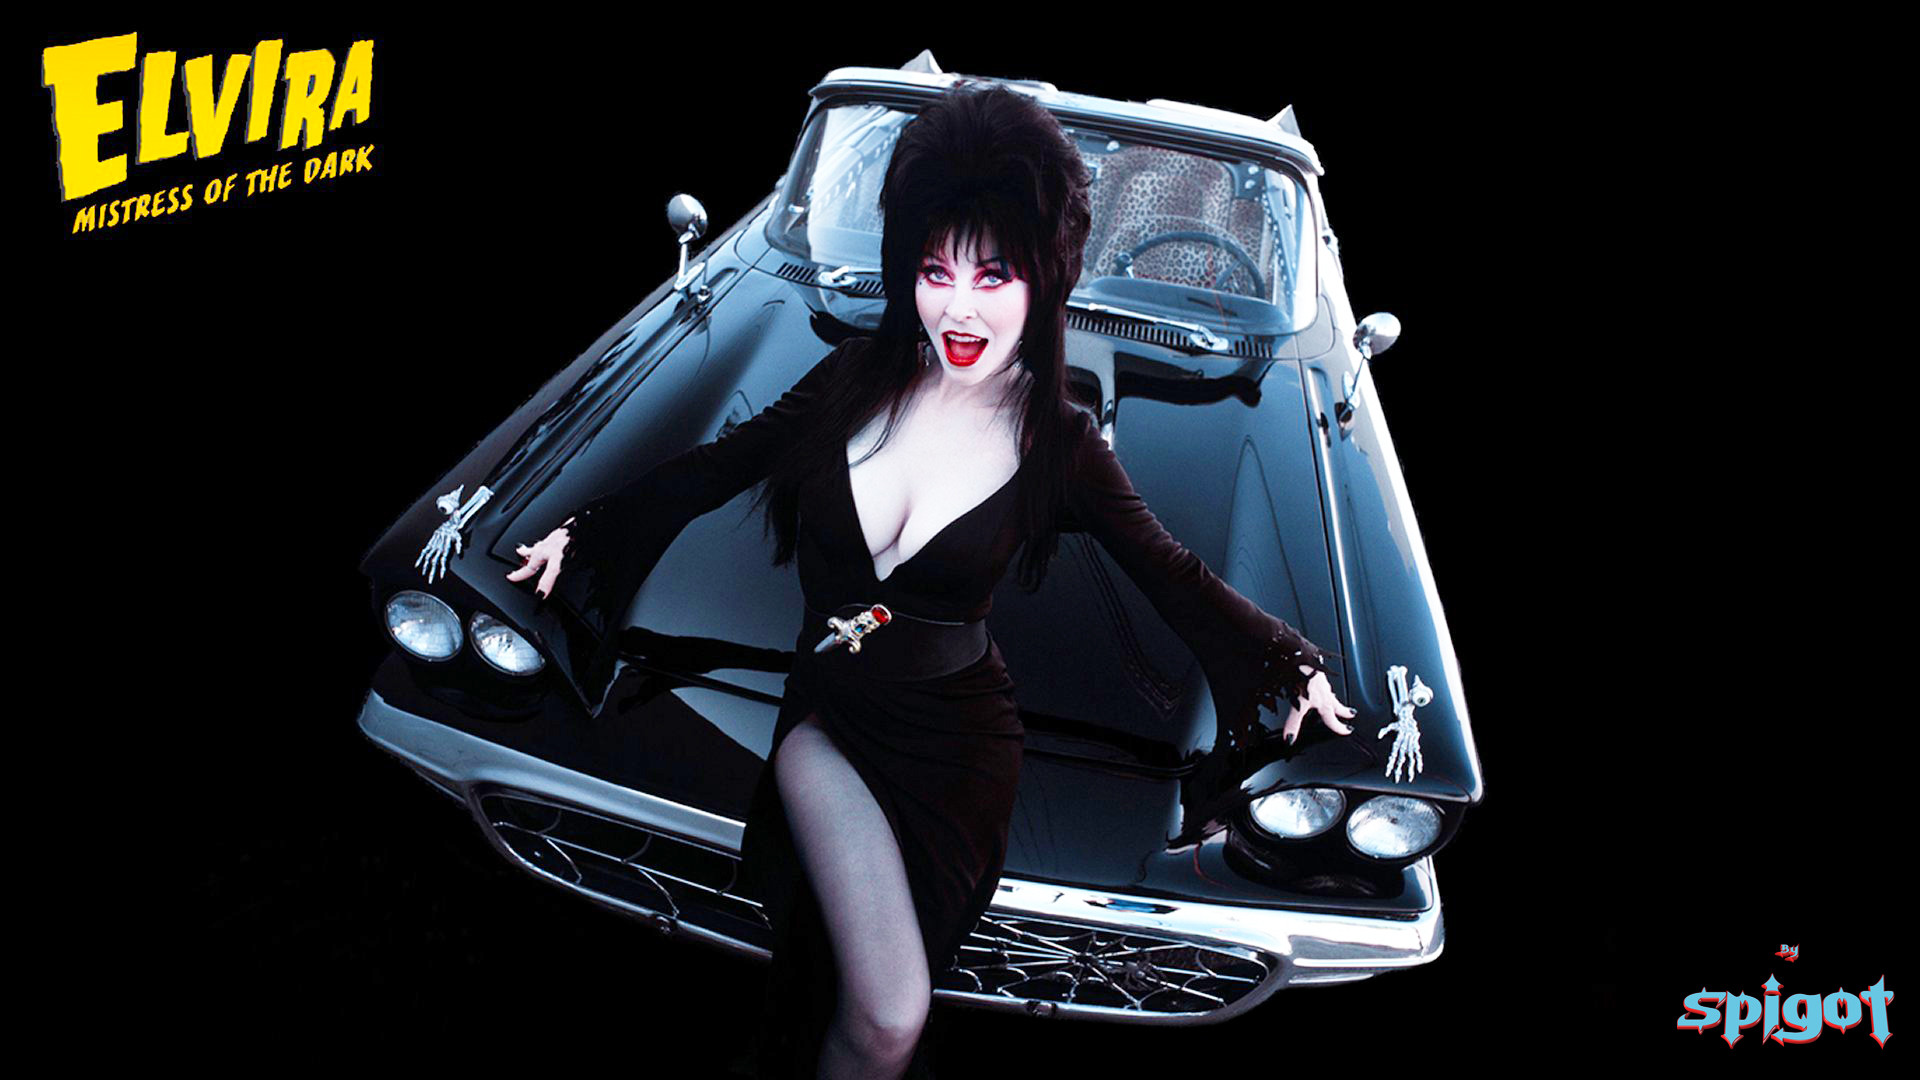 Elvira Wallpaper